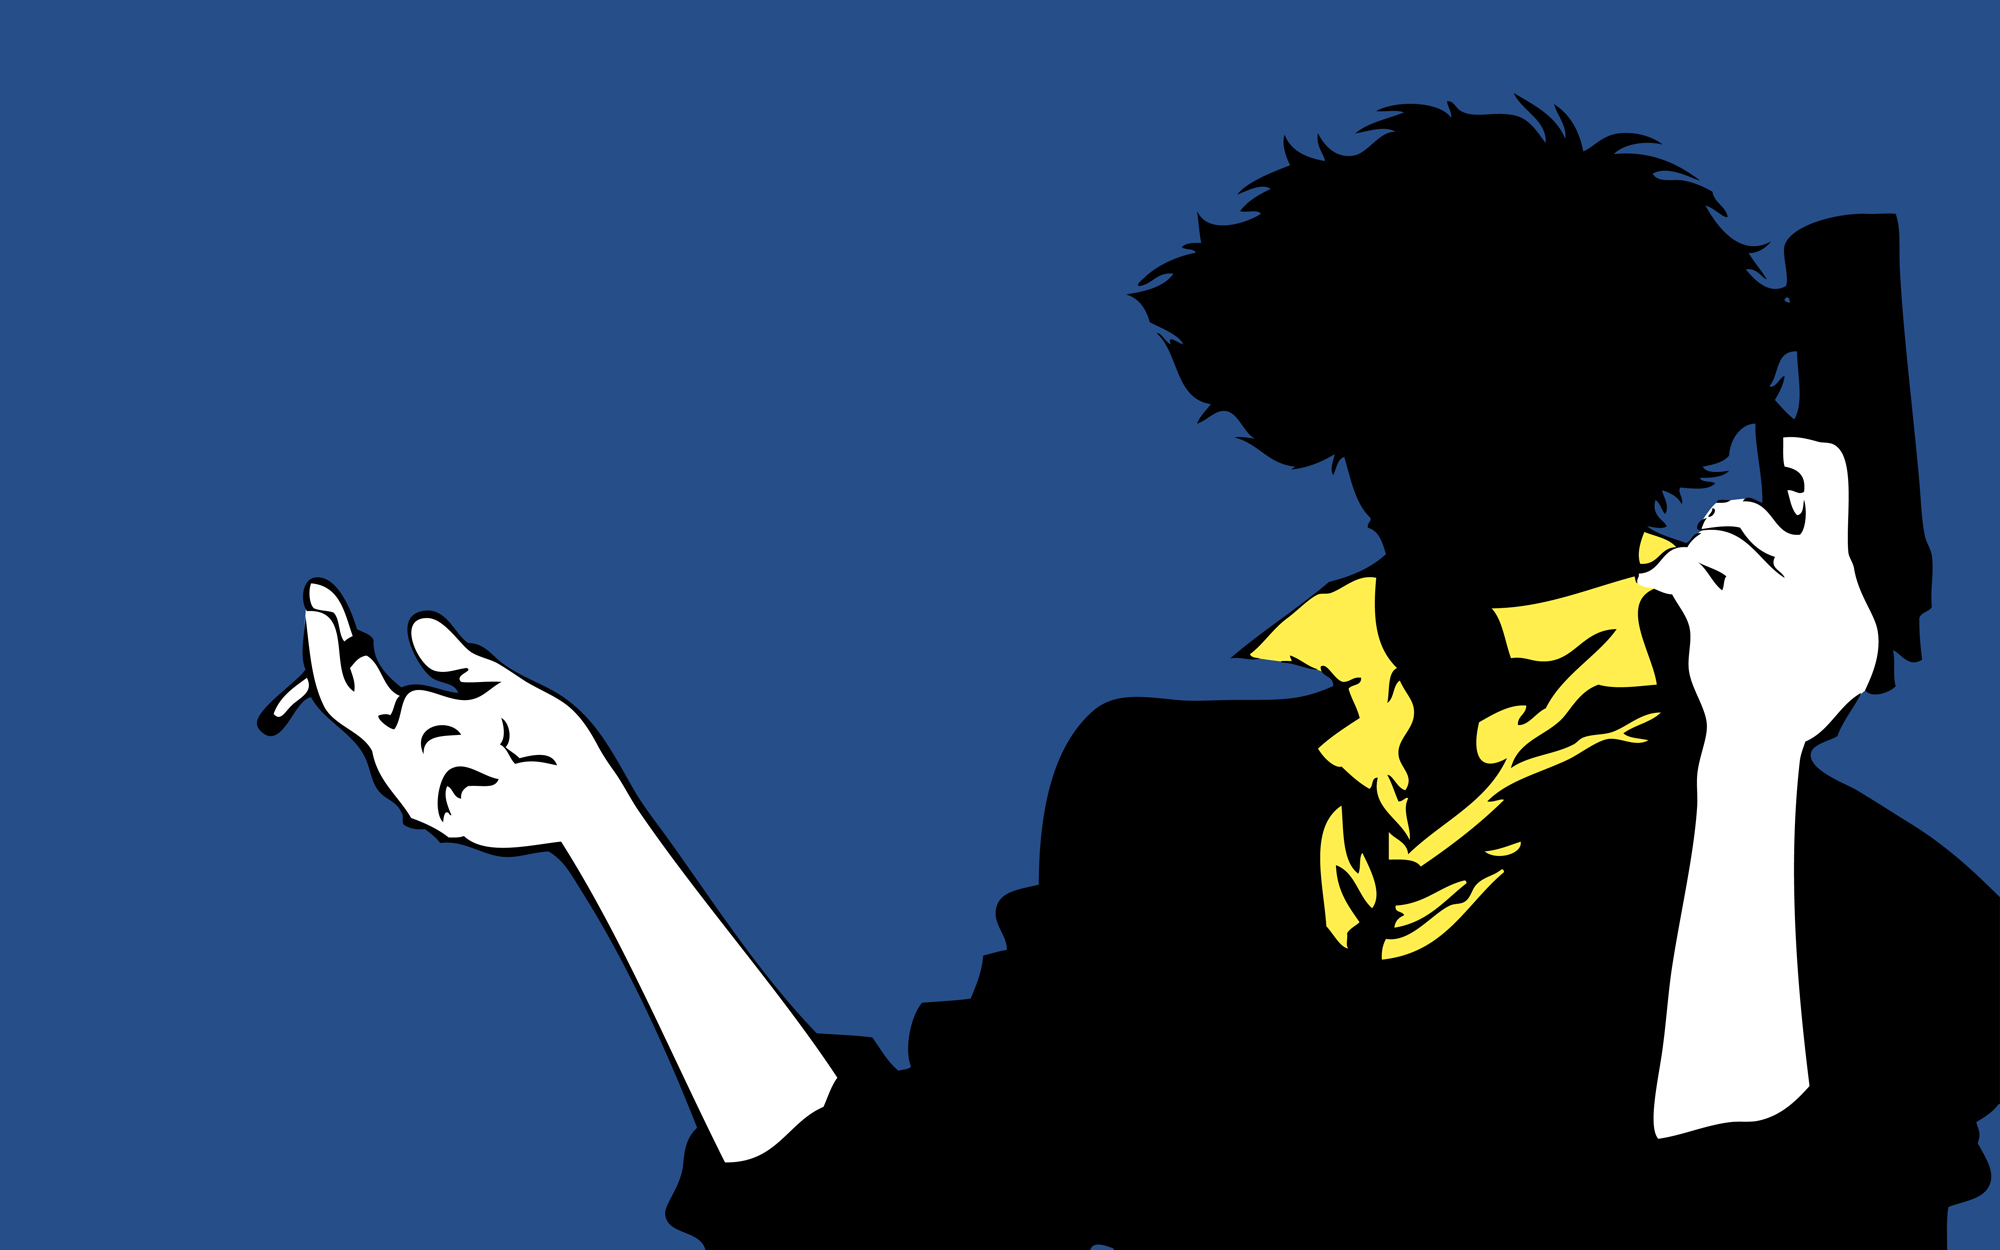 Cowboy Bebop Spike Speigel Jet Black Faye Valentine Edward Ein Bounty Hunter Abstract Anime Artwork Poster Print 4x6 8 5x11 11x17 18x24 24x36